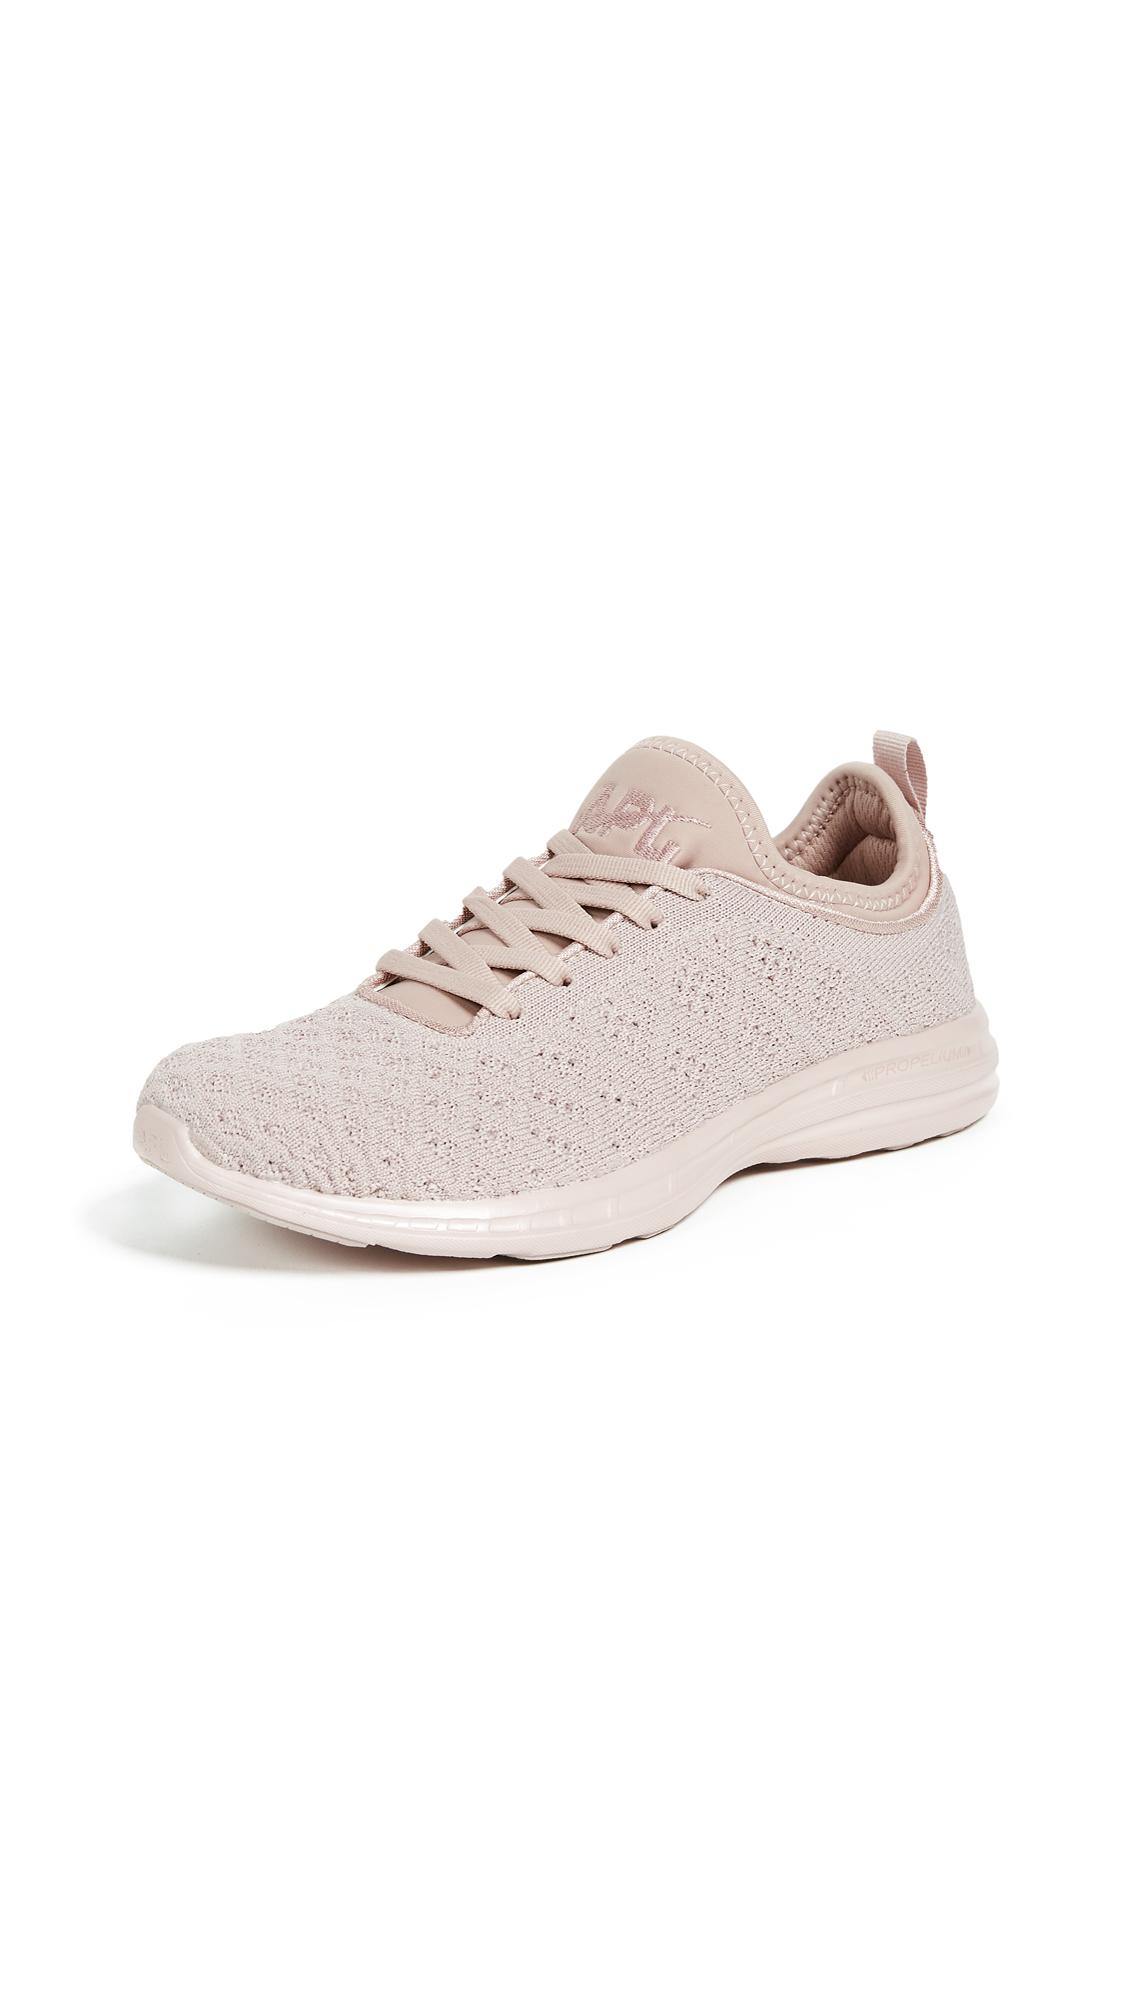 APL: Athletic Propulsion Labs TechLoom Phantom Sneakers - Red Clay